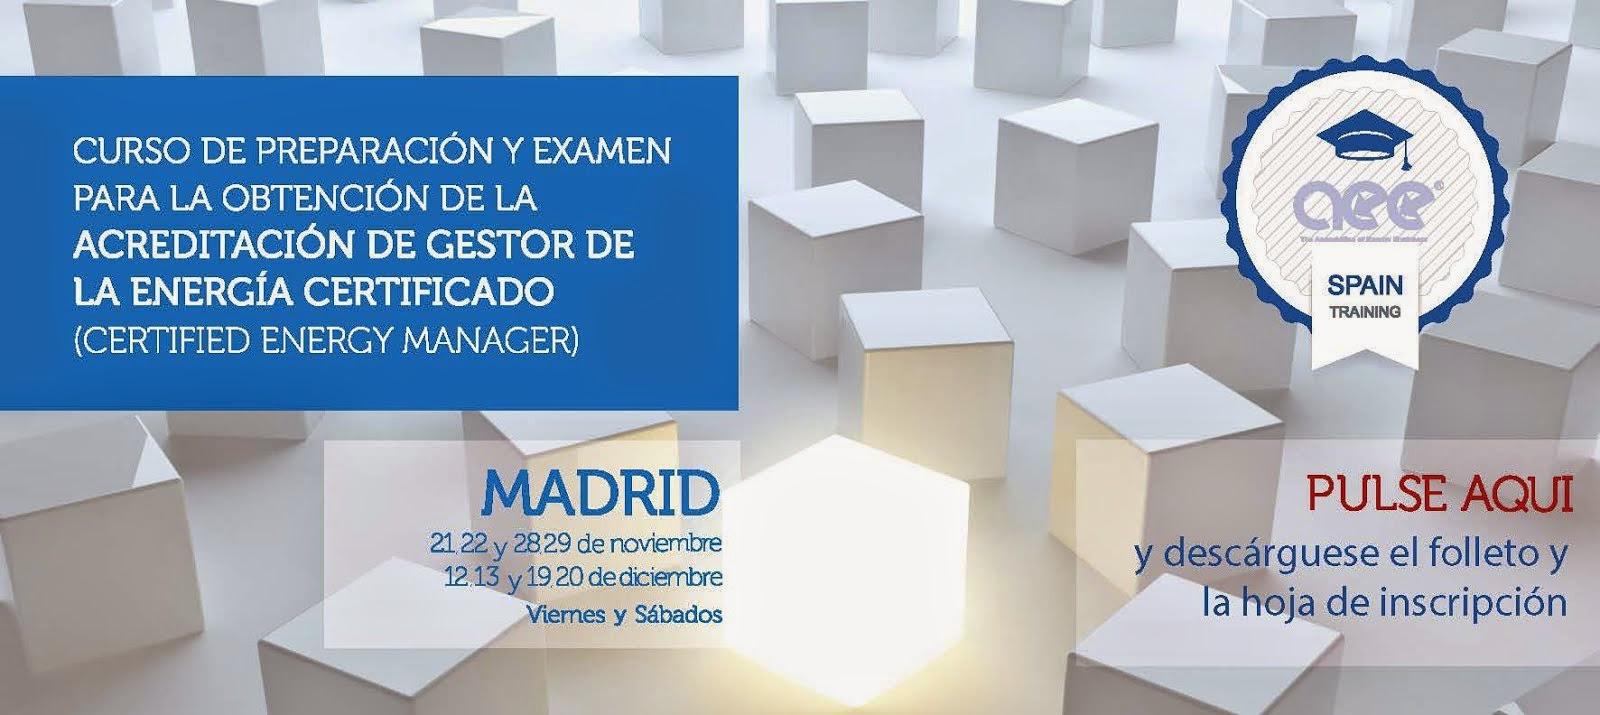 Curso CEM PT Madrid Nov-Dic14